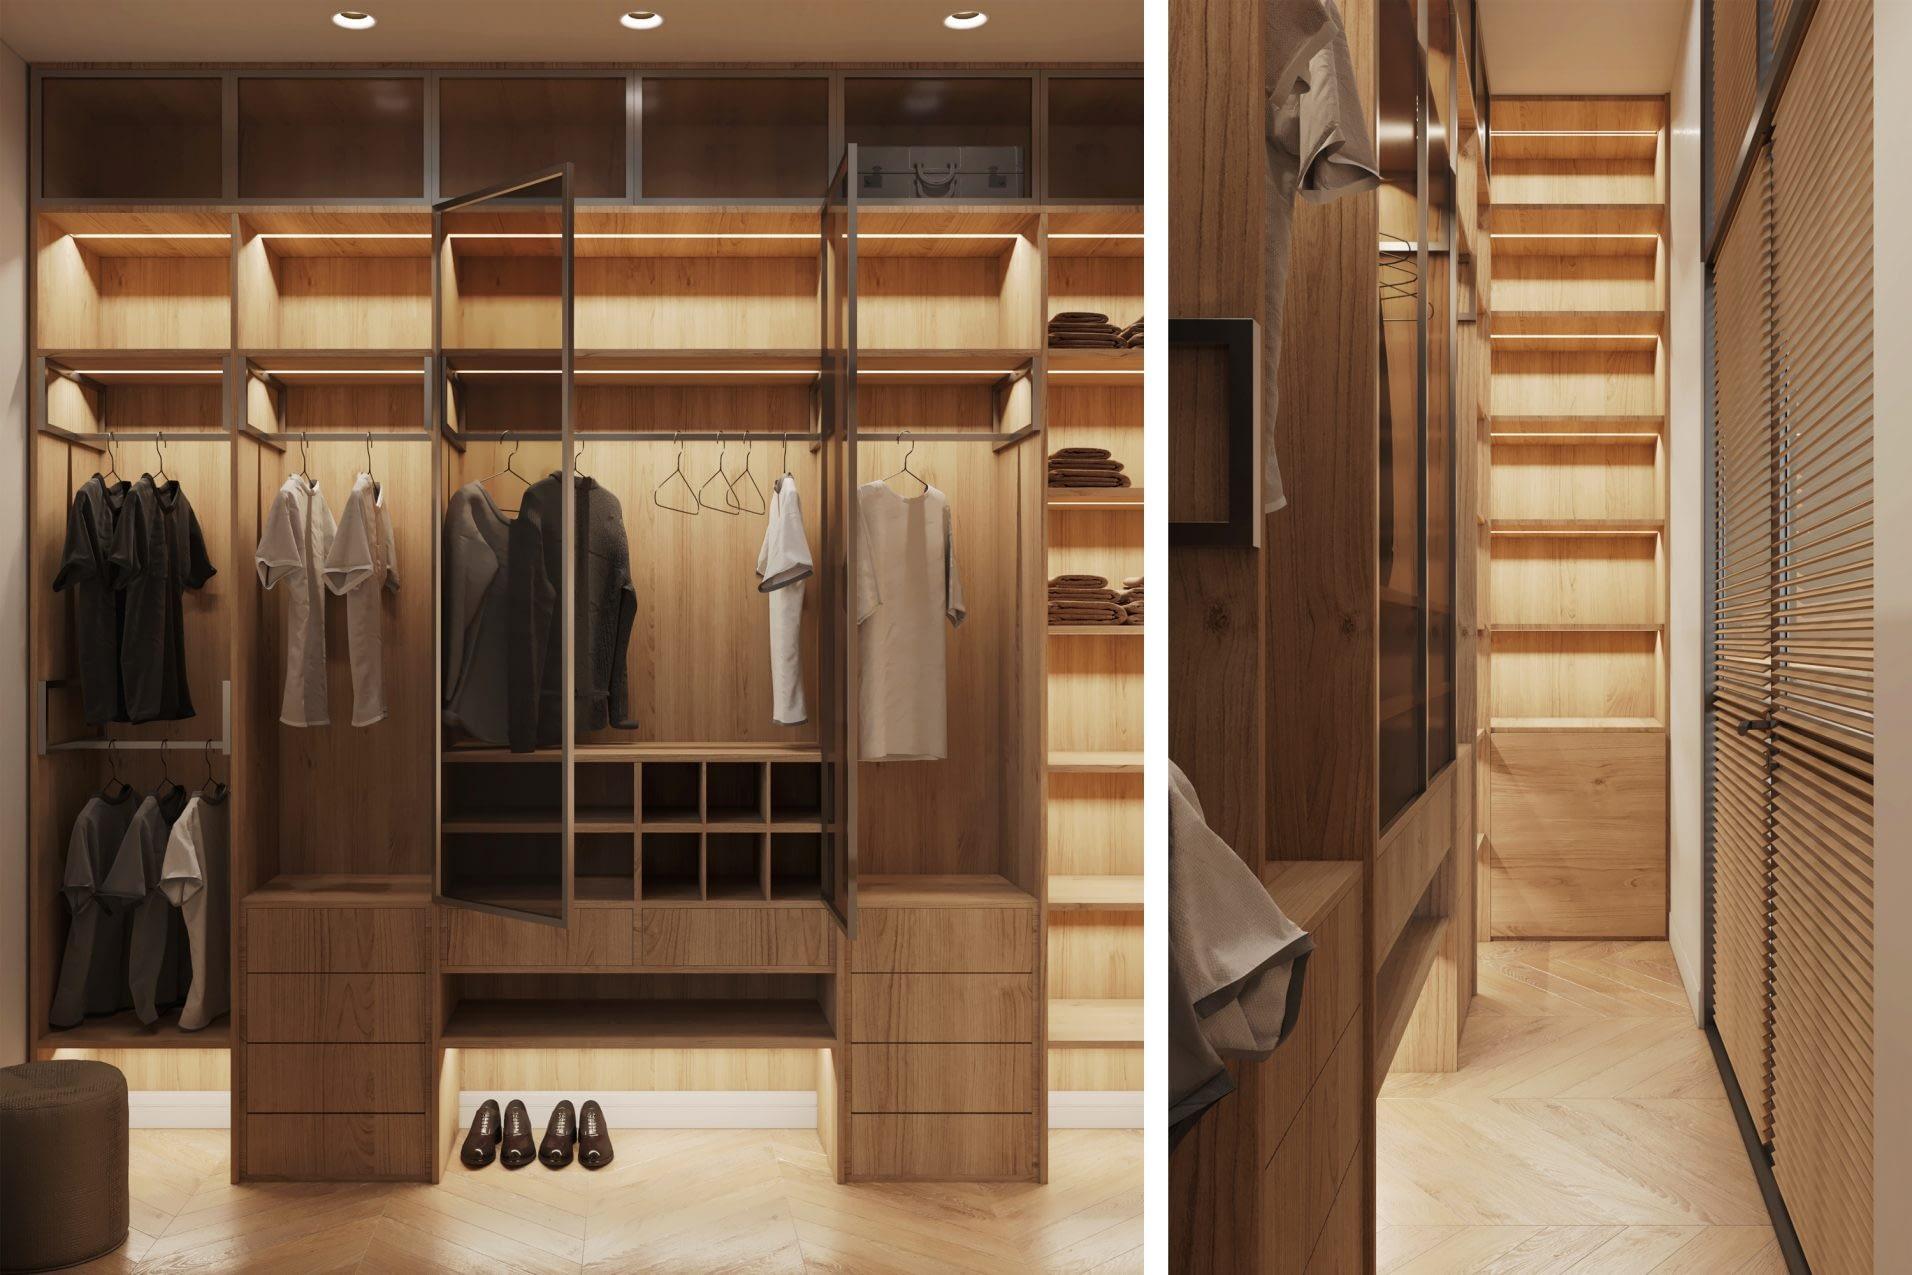 дизайн интерьера гардероба квартиры в ЖК Риверстоун